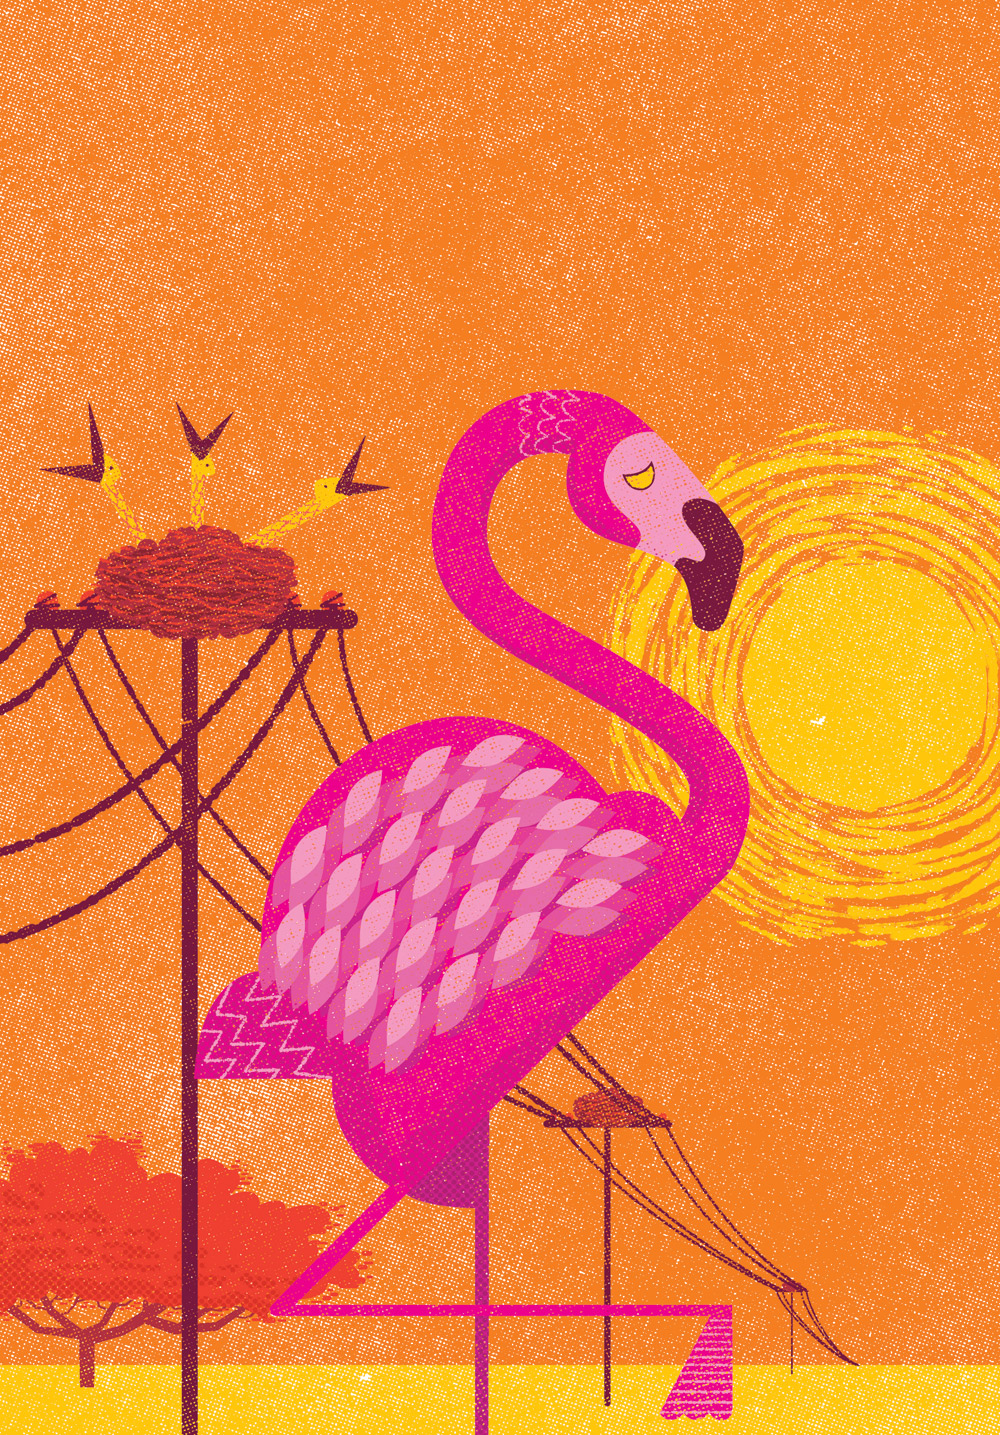 Cover illustration for Wine Republic magazine, Argentina.